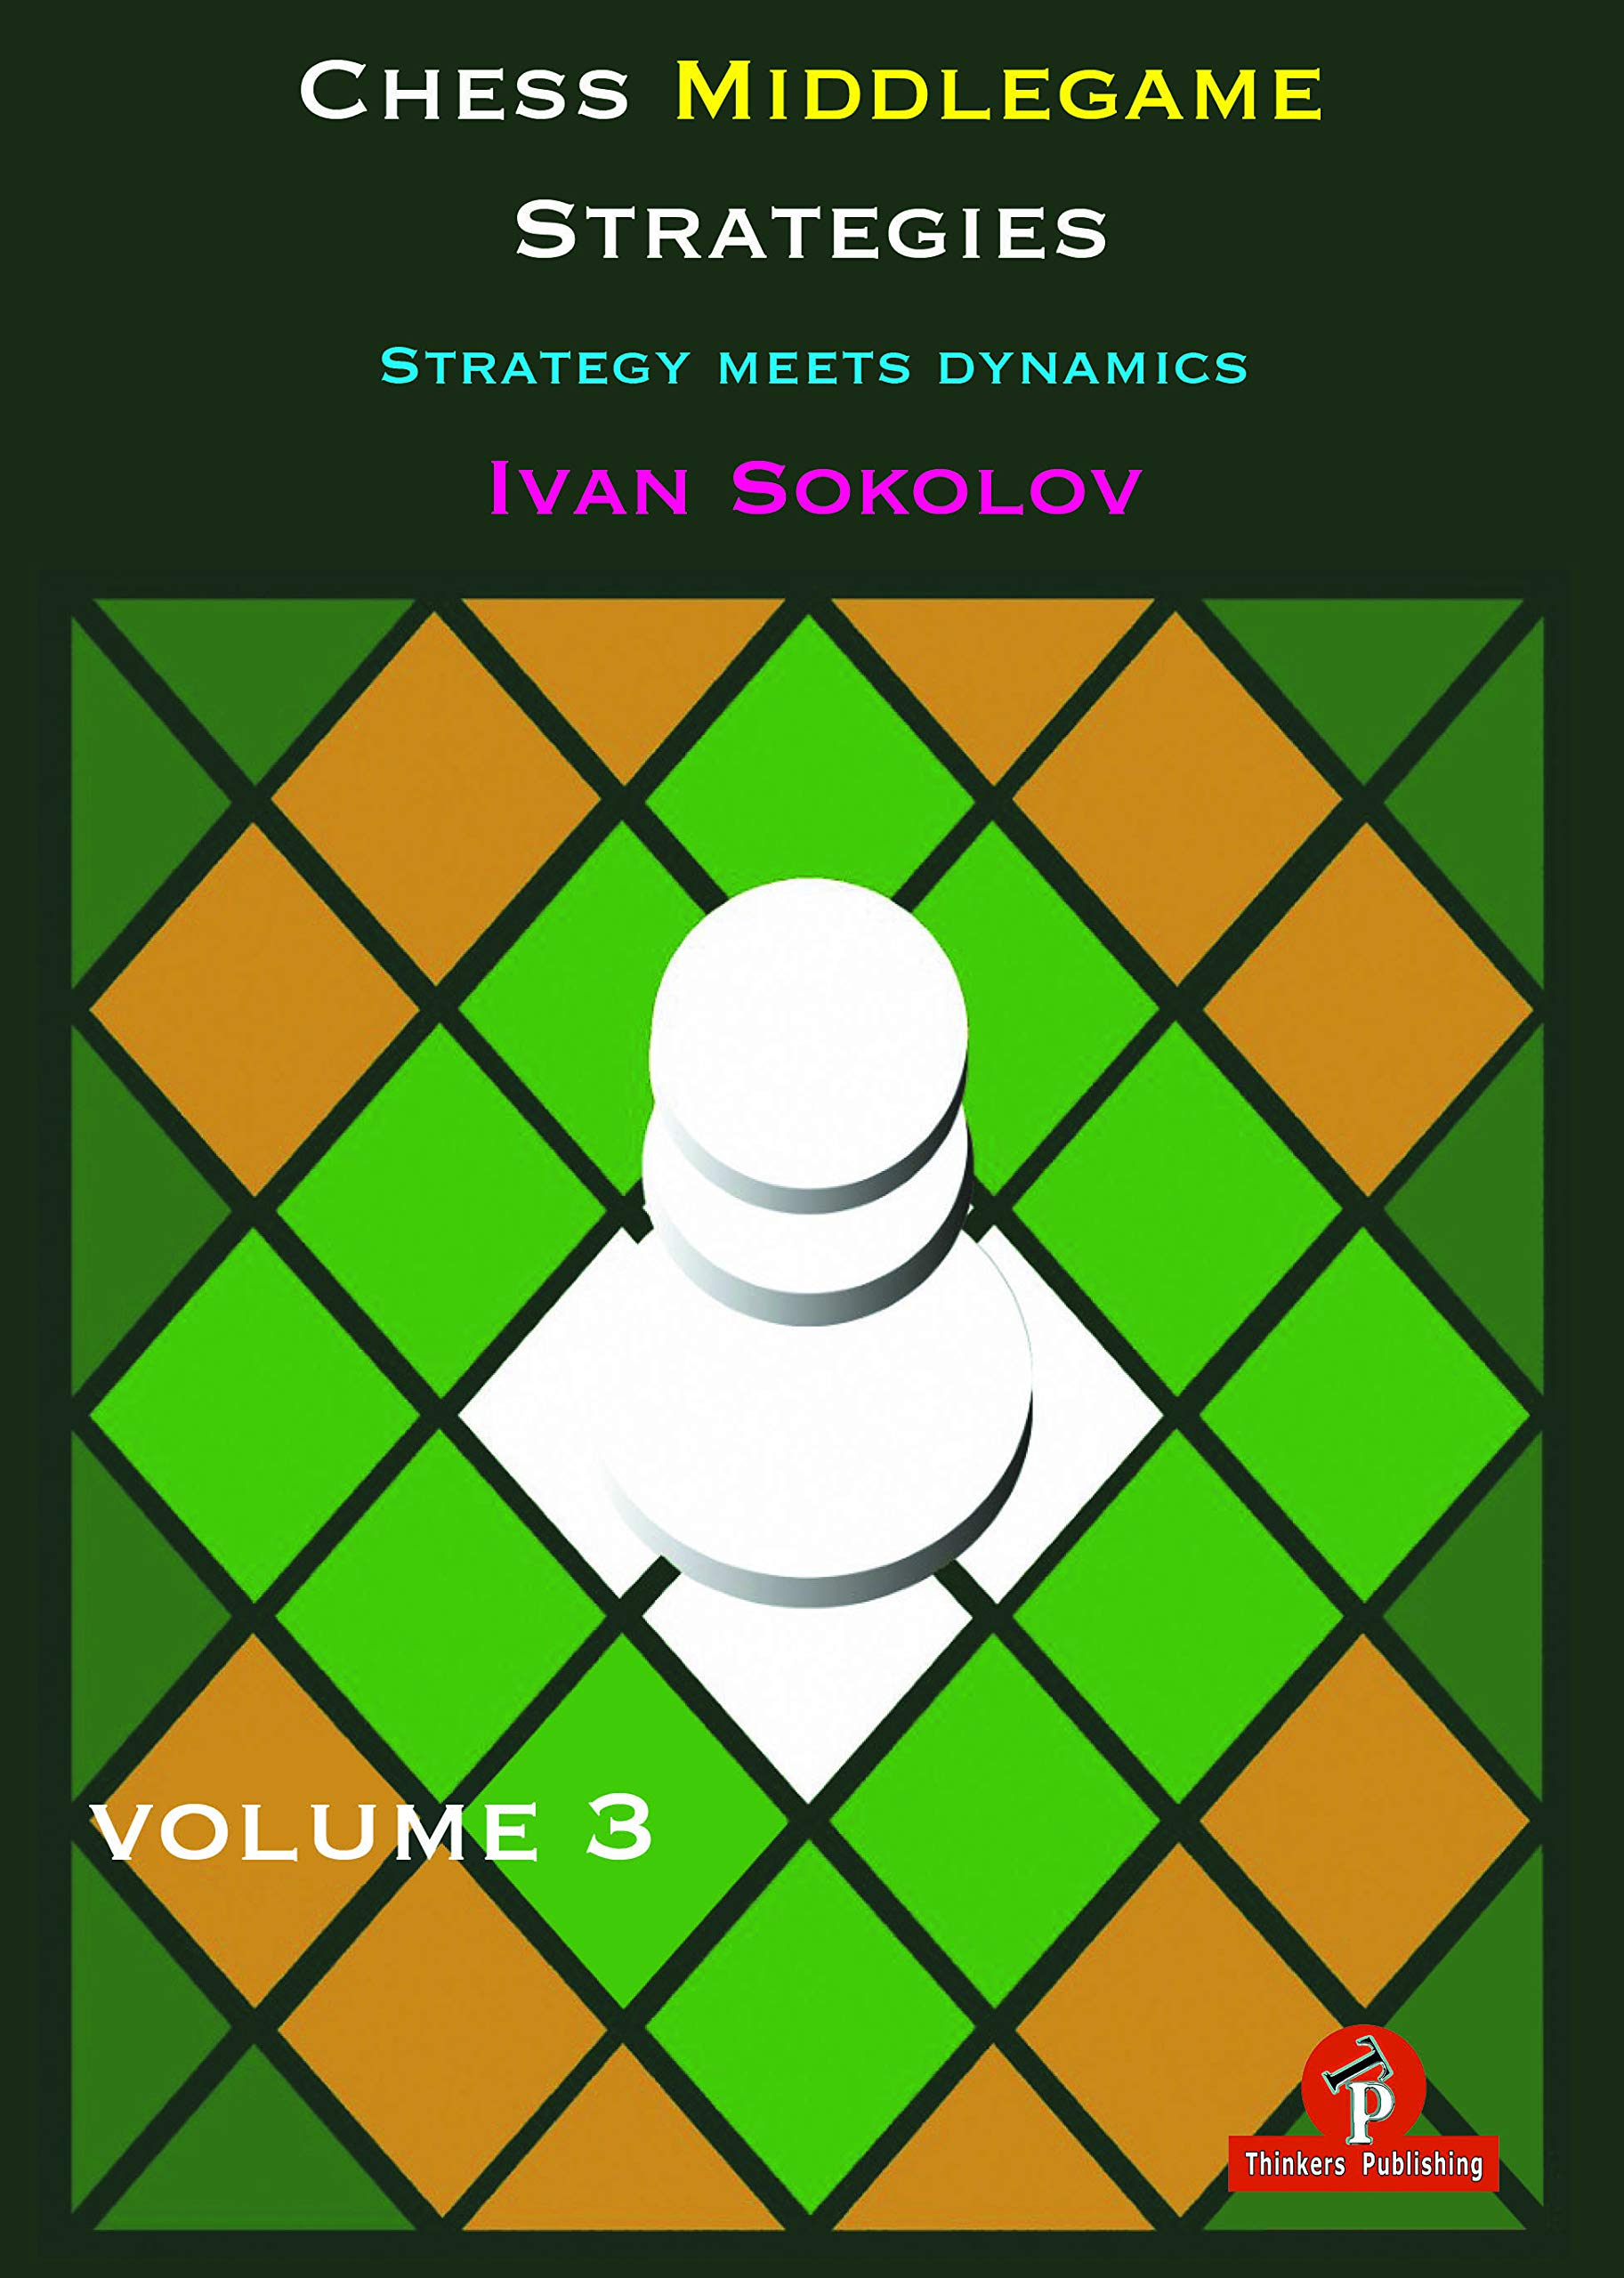 Chess Middlegame Strategies - Strategy Meets Dynamics Volume 3, Ivan Sokolov, Thinker's Publishing. 2019, ISBN-13  :  978-9492510600